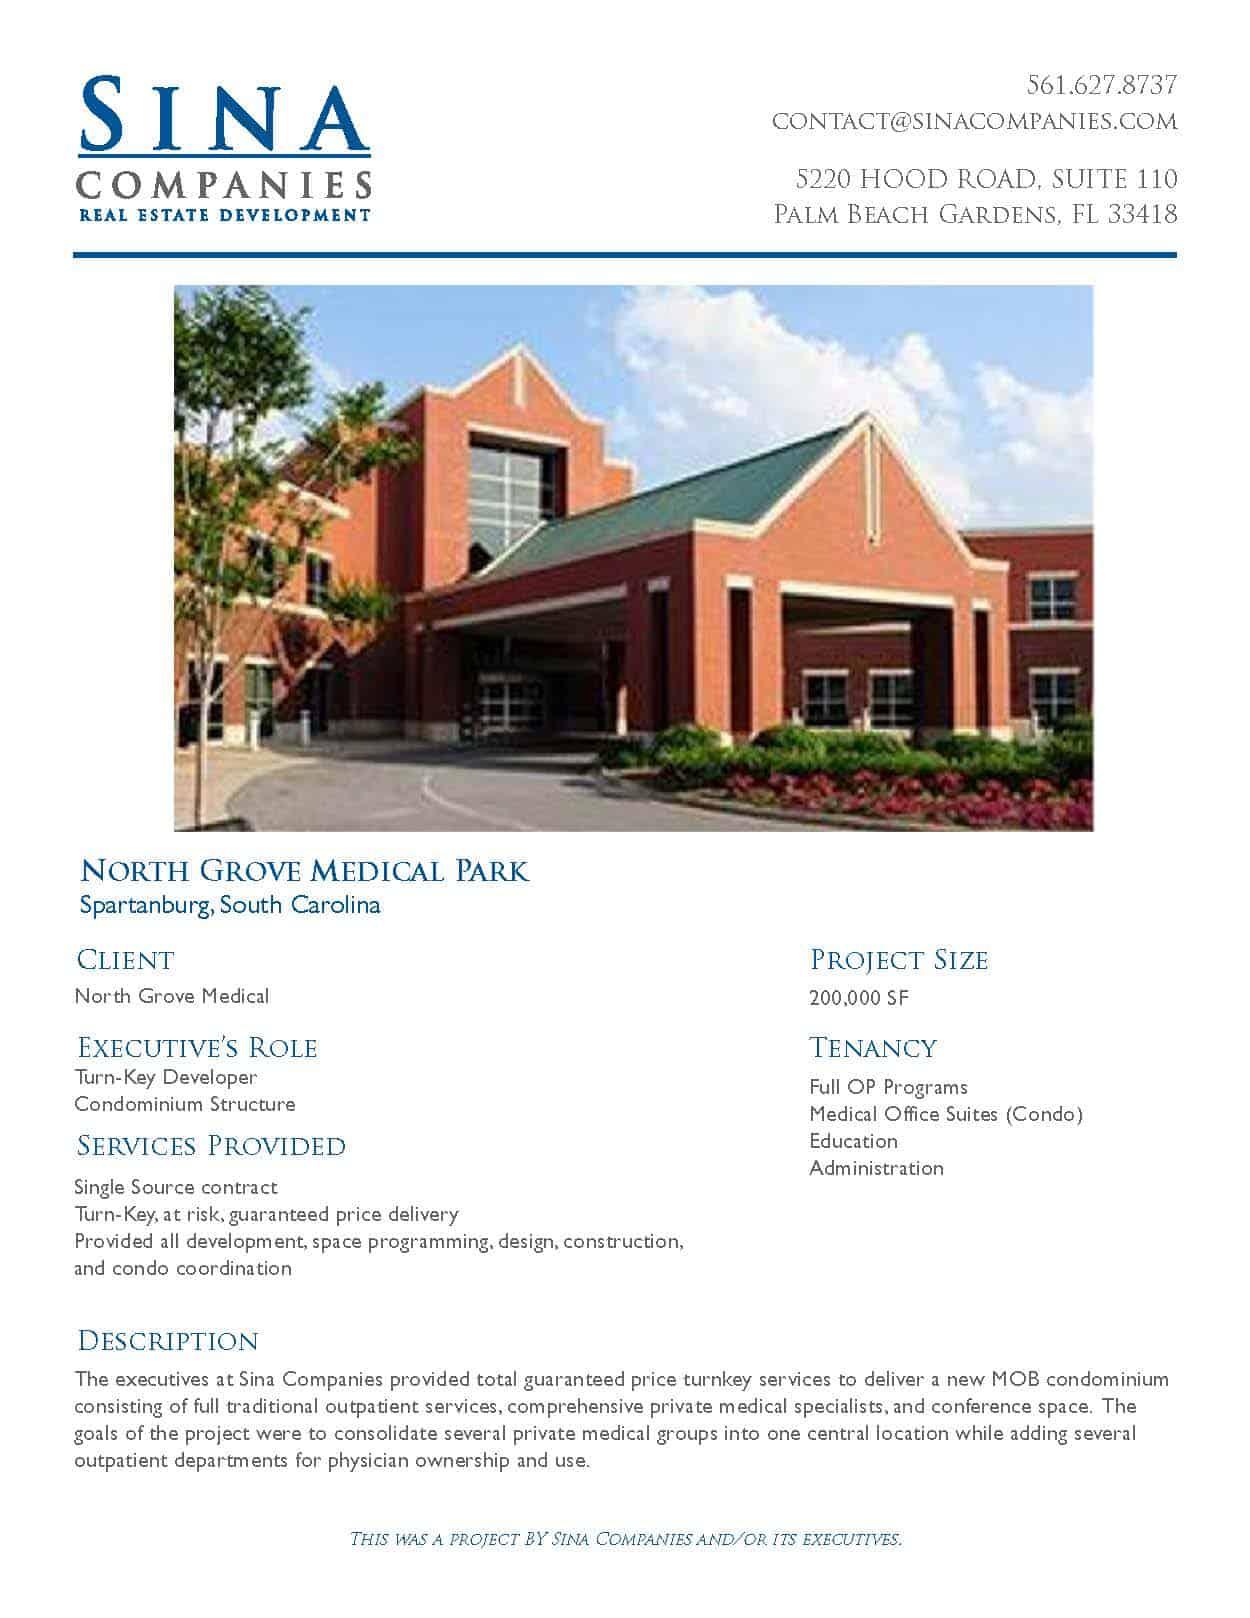 North Grove Medical Park in Spartanburg